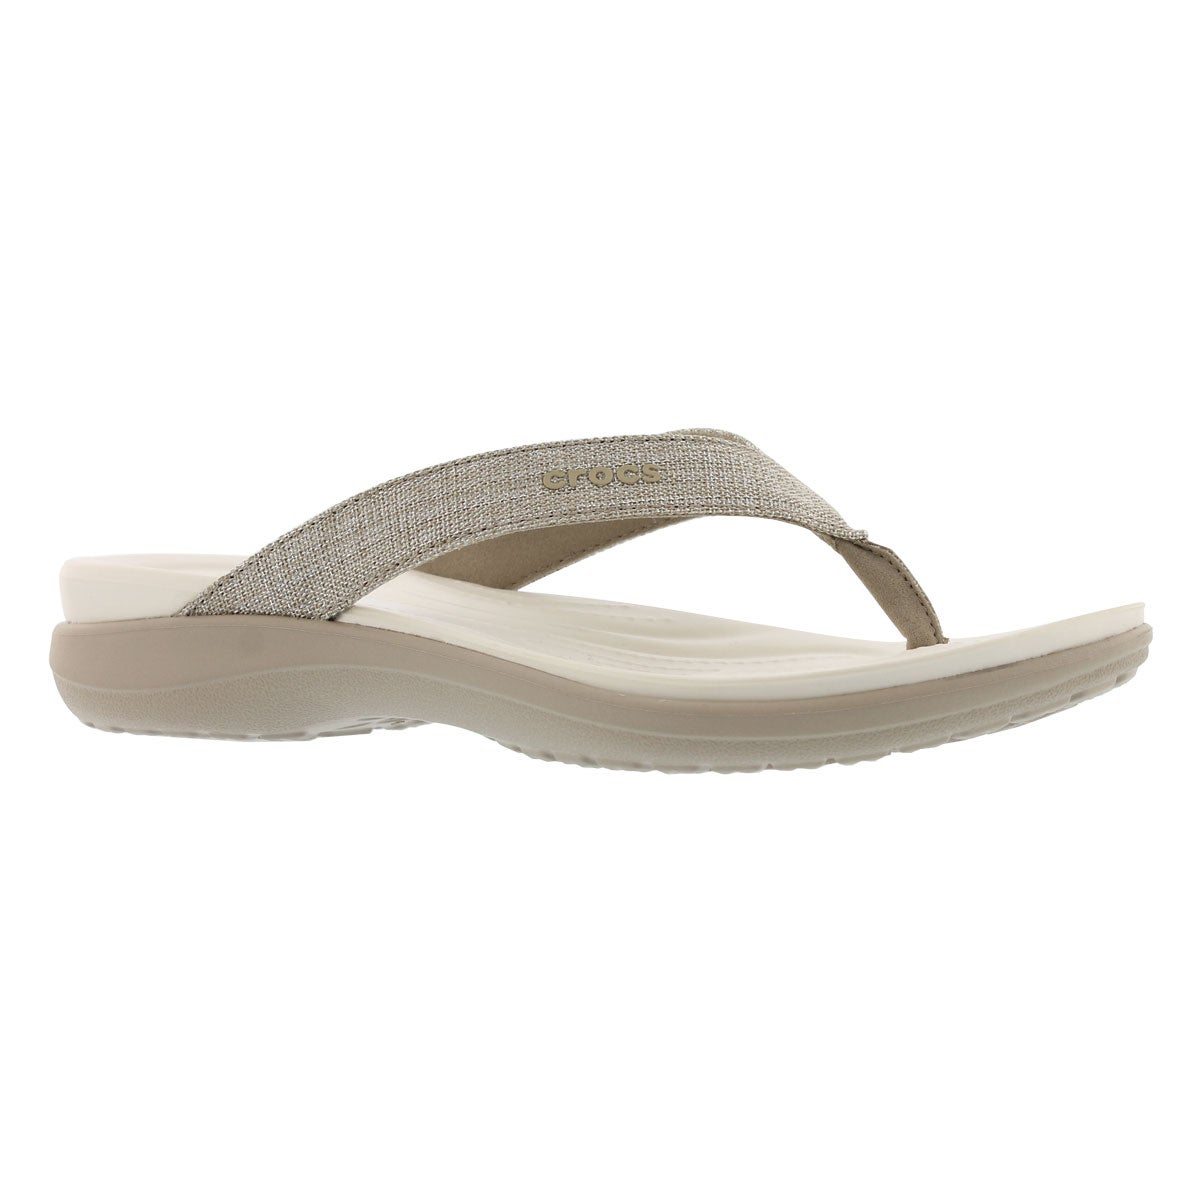 Women's CAPRI V SHIMMER cobblestone sandals